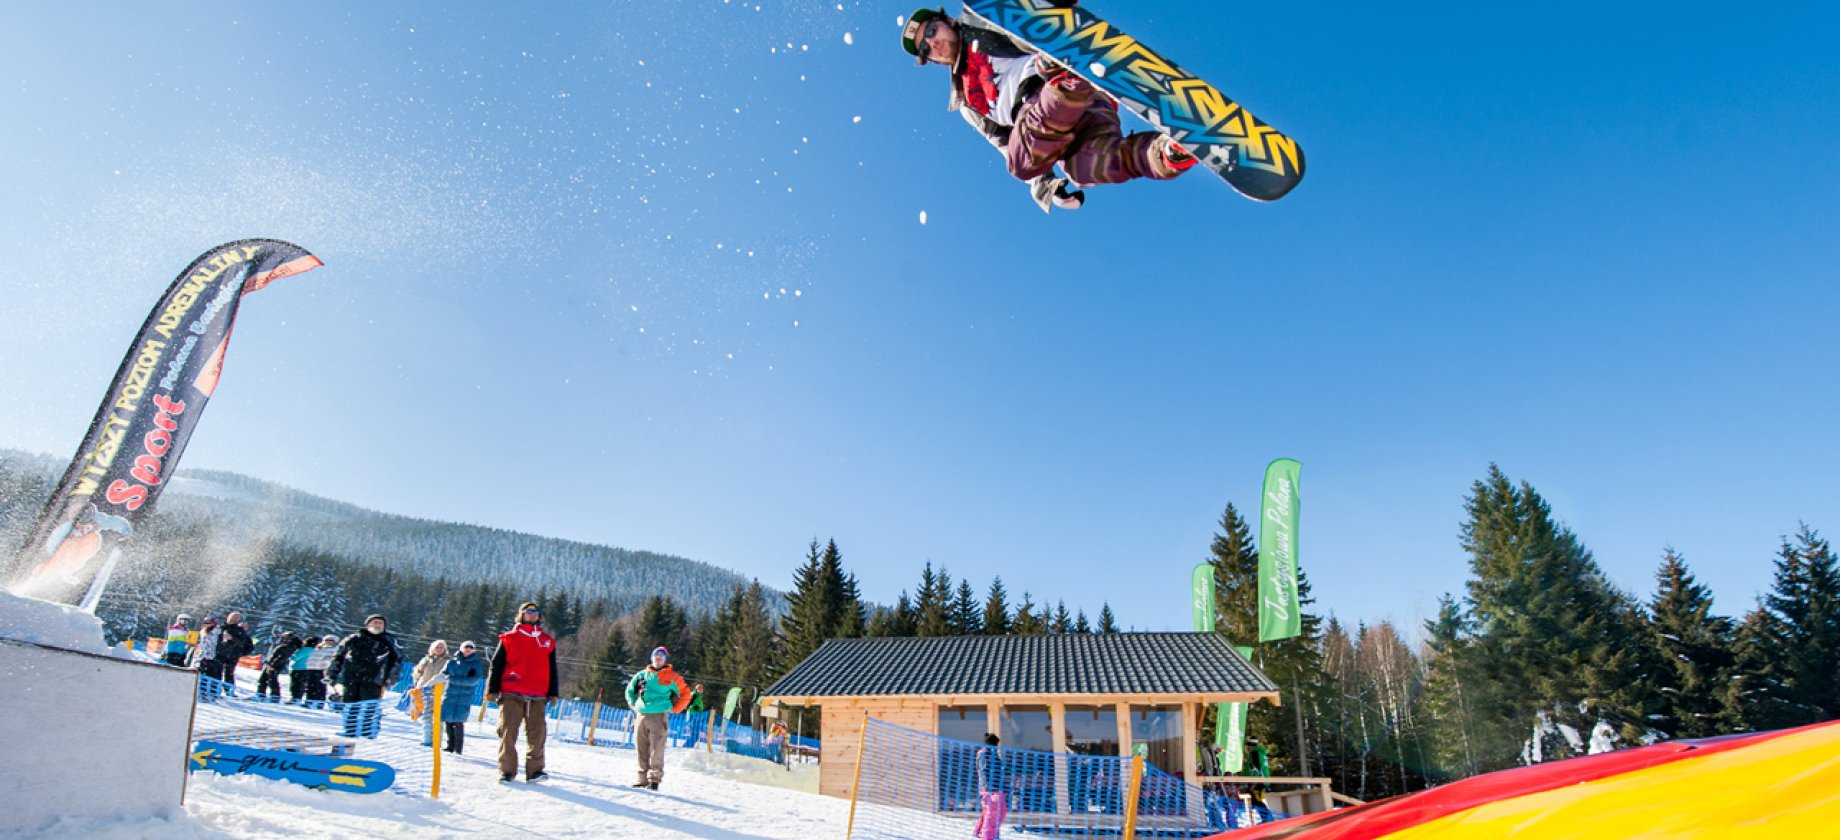 Snow & fun park